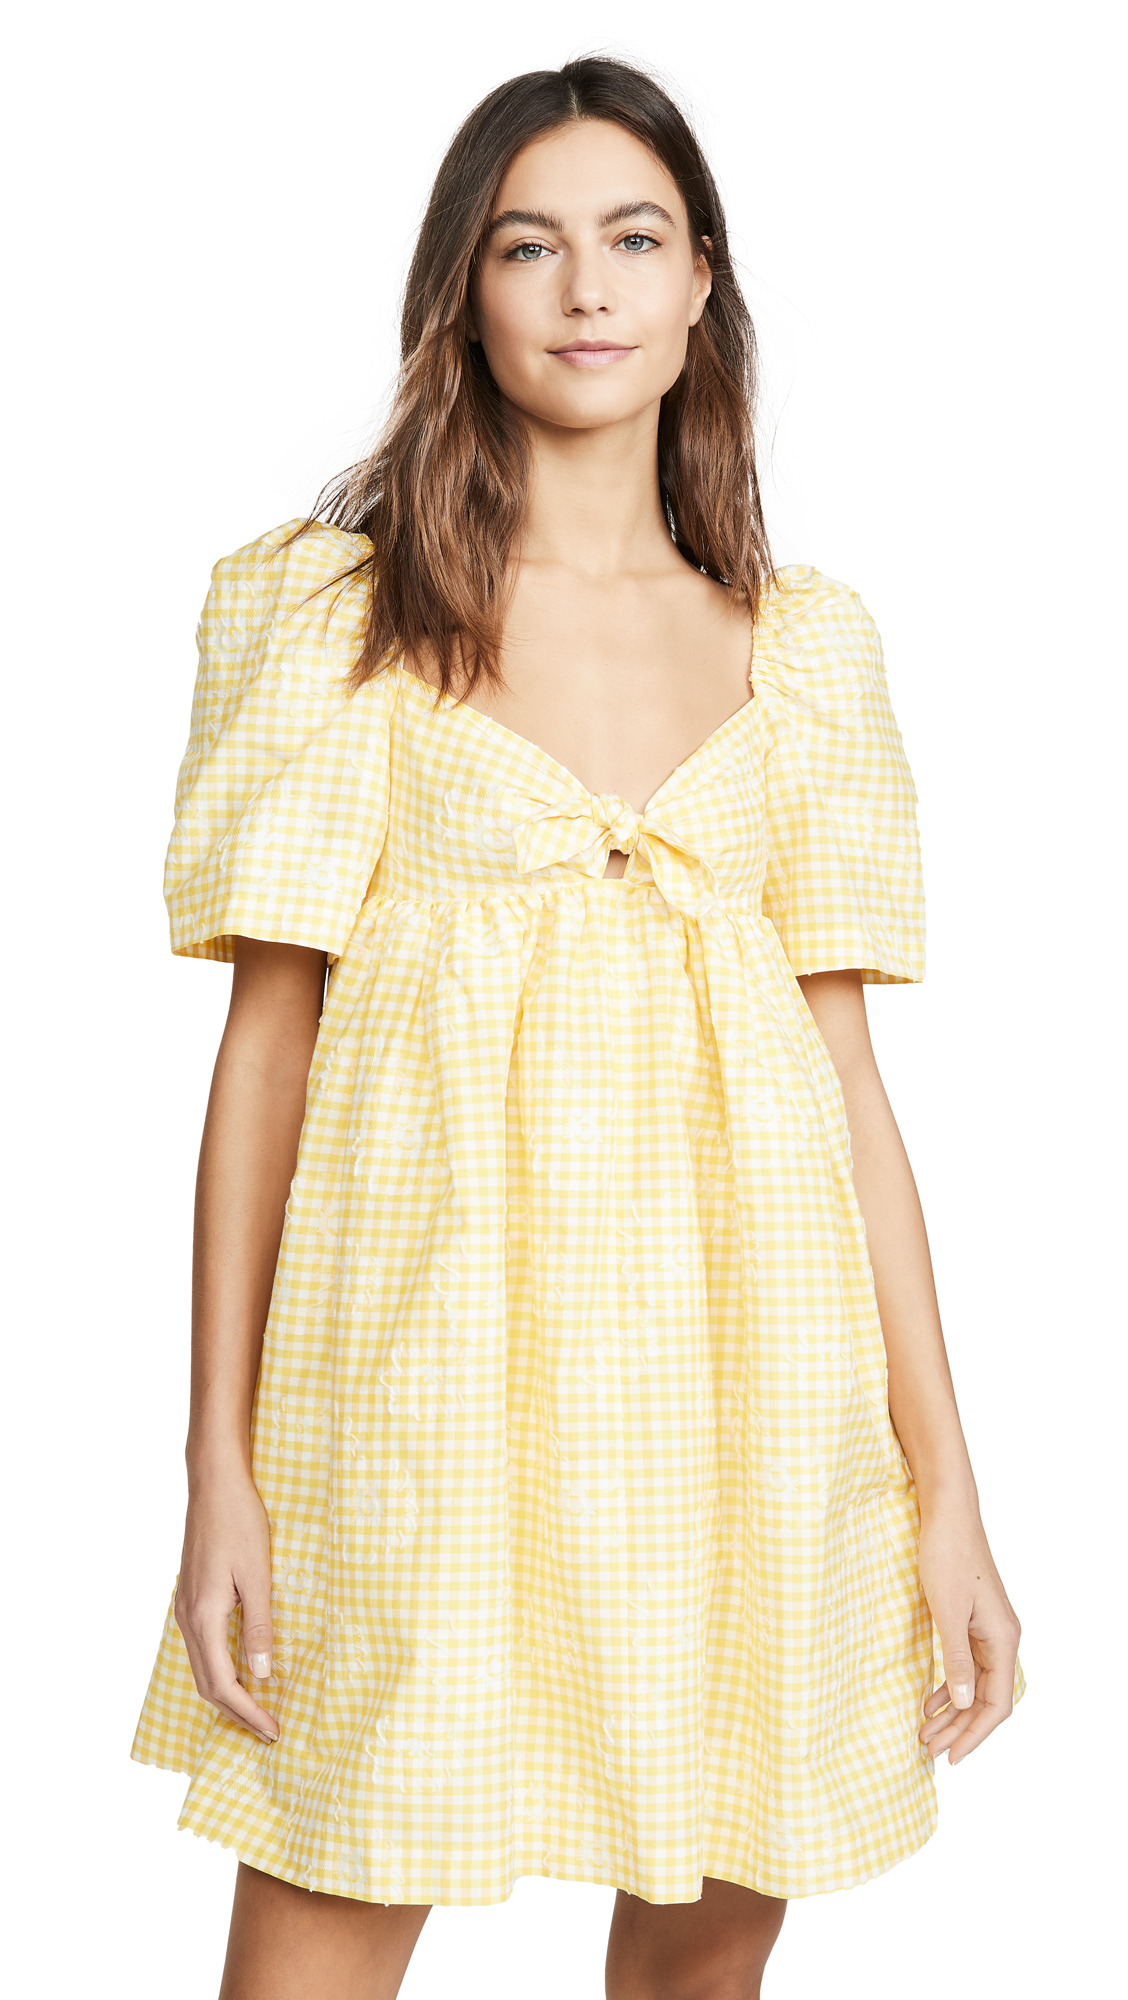 pushBUTTON Puff Mini Dress - 50% Off Sale